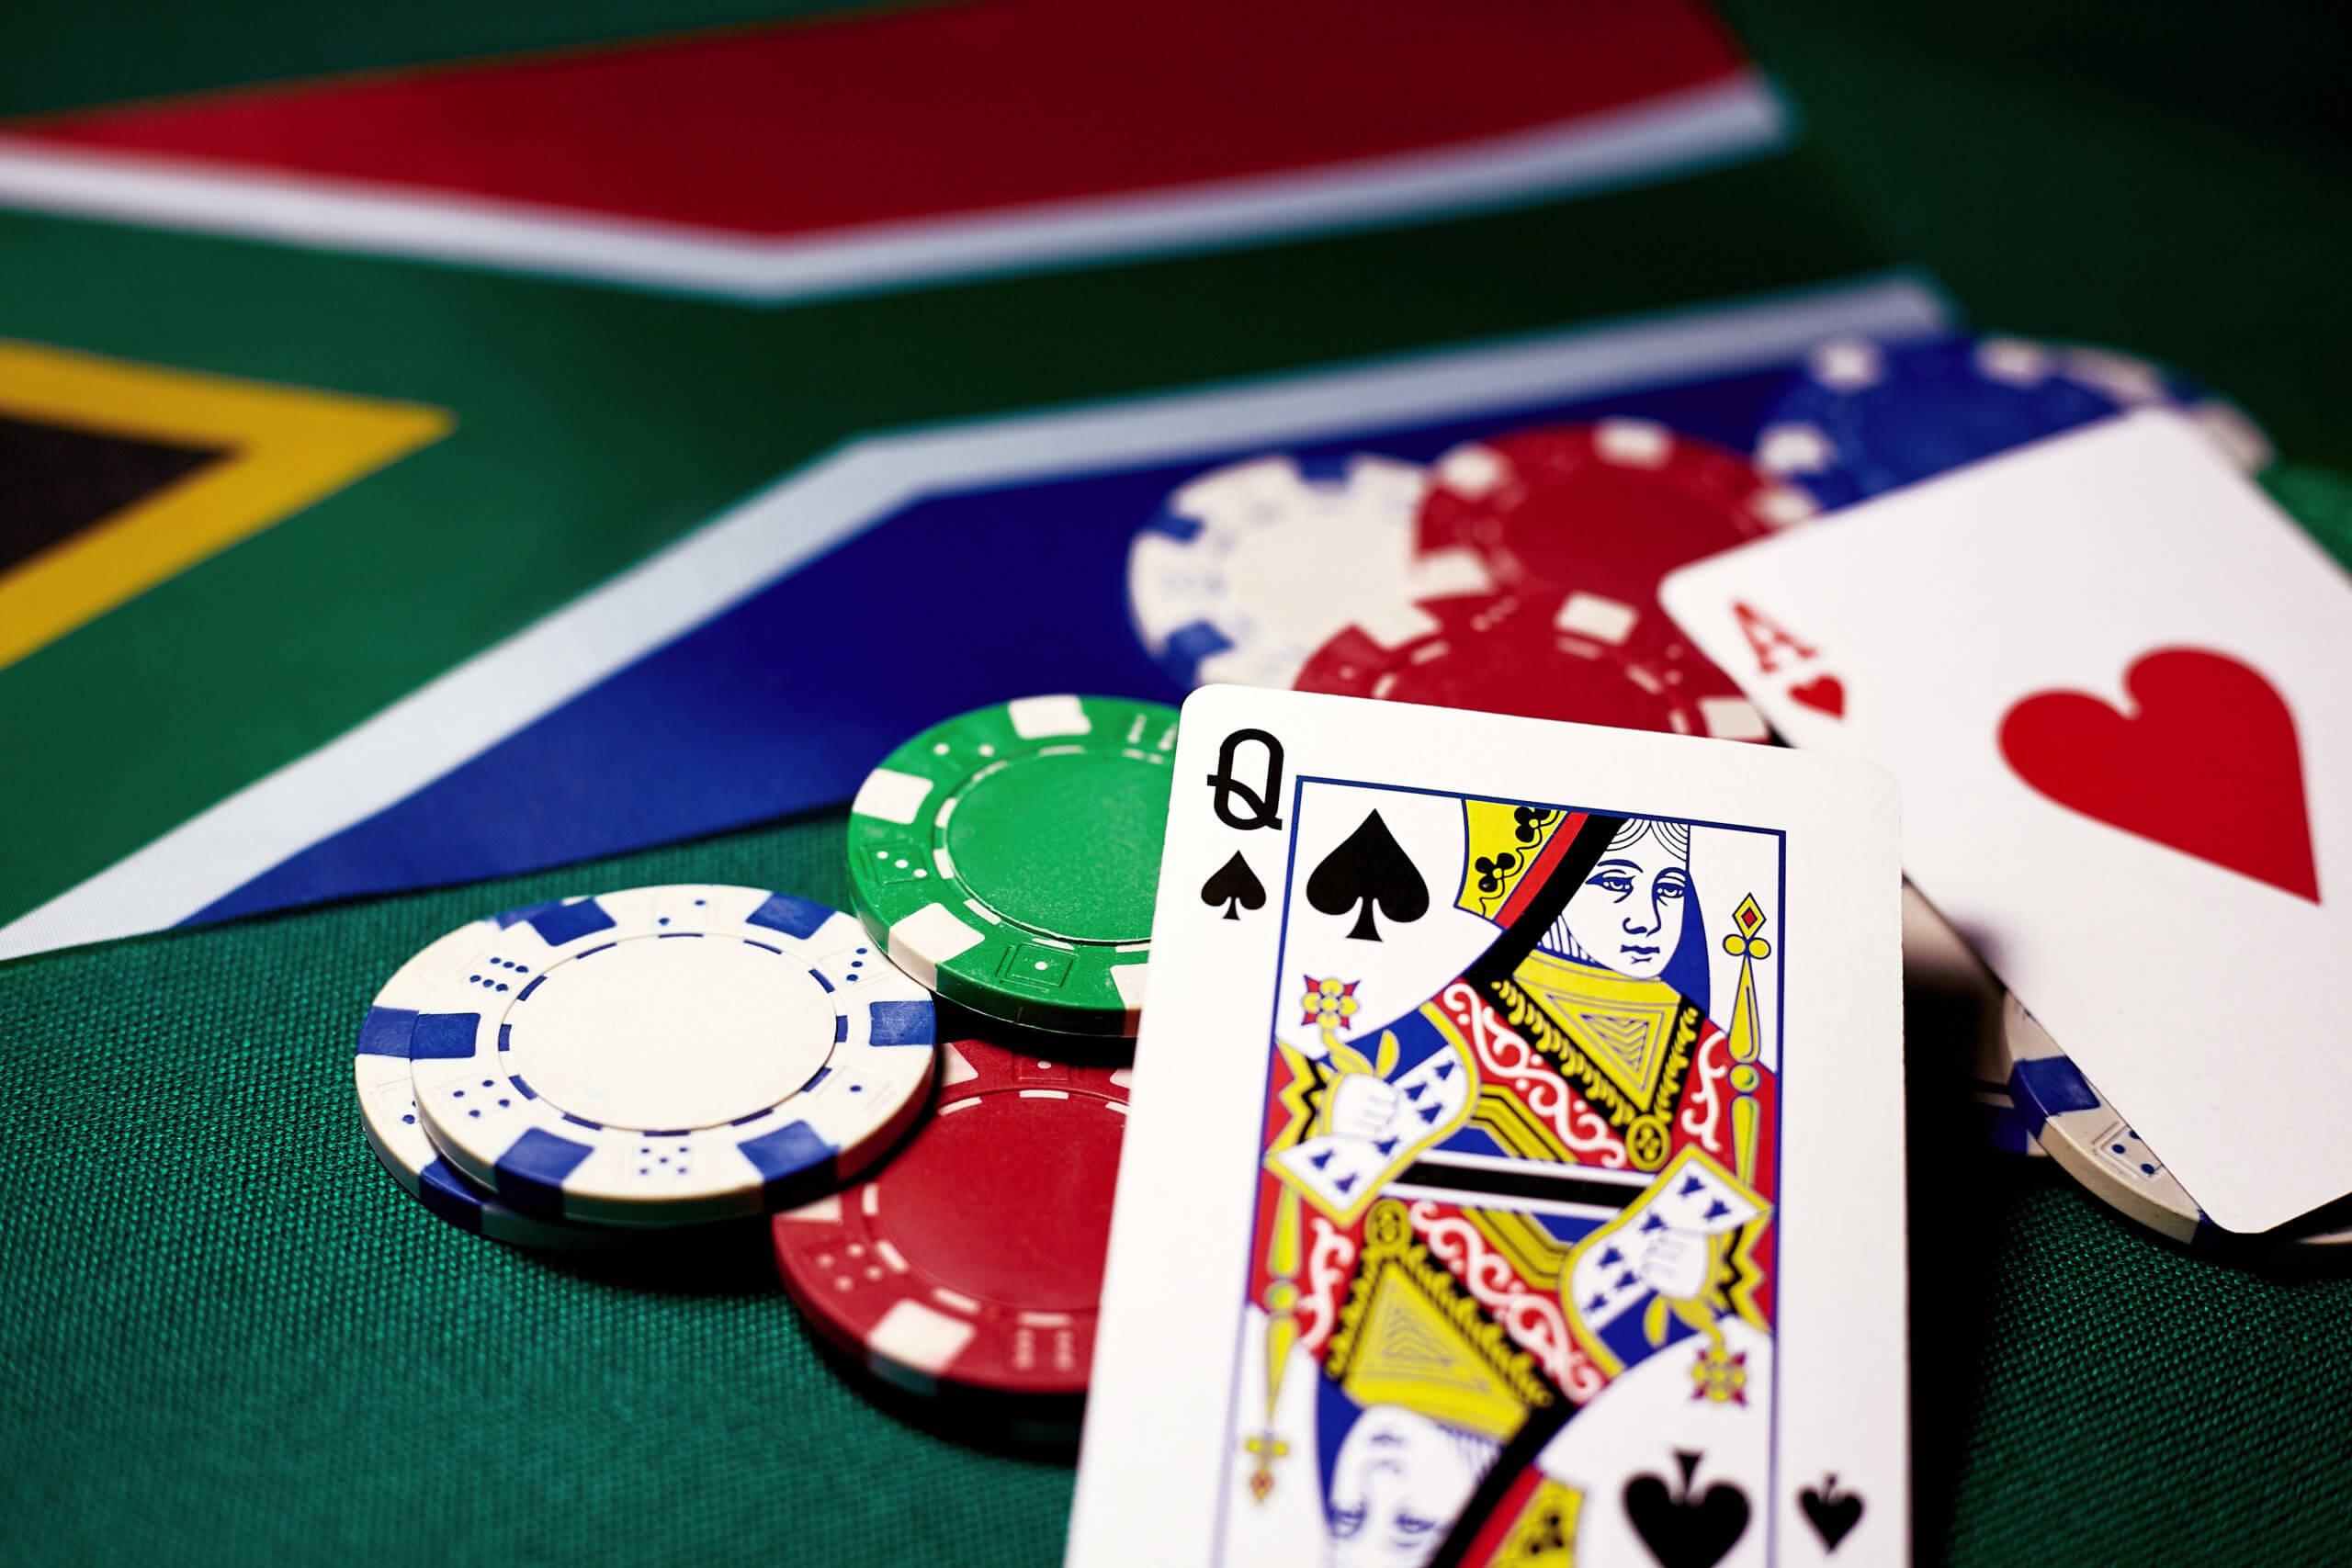 Queen of Spades Gambling Casino Card Game Hearts